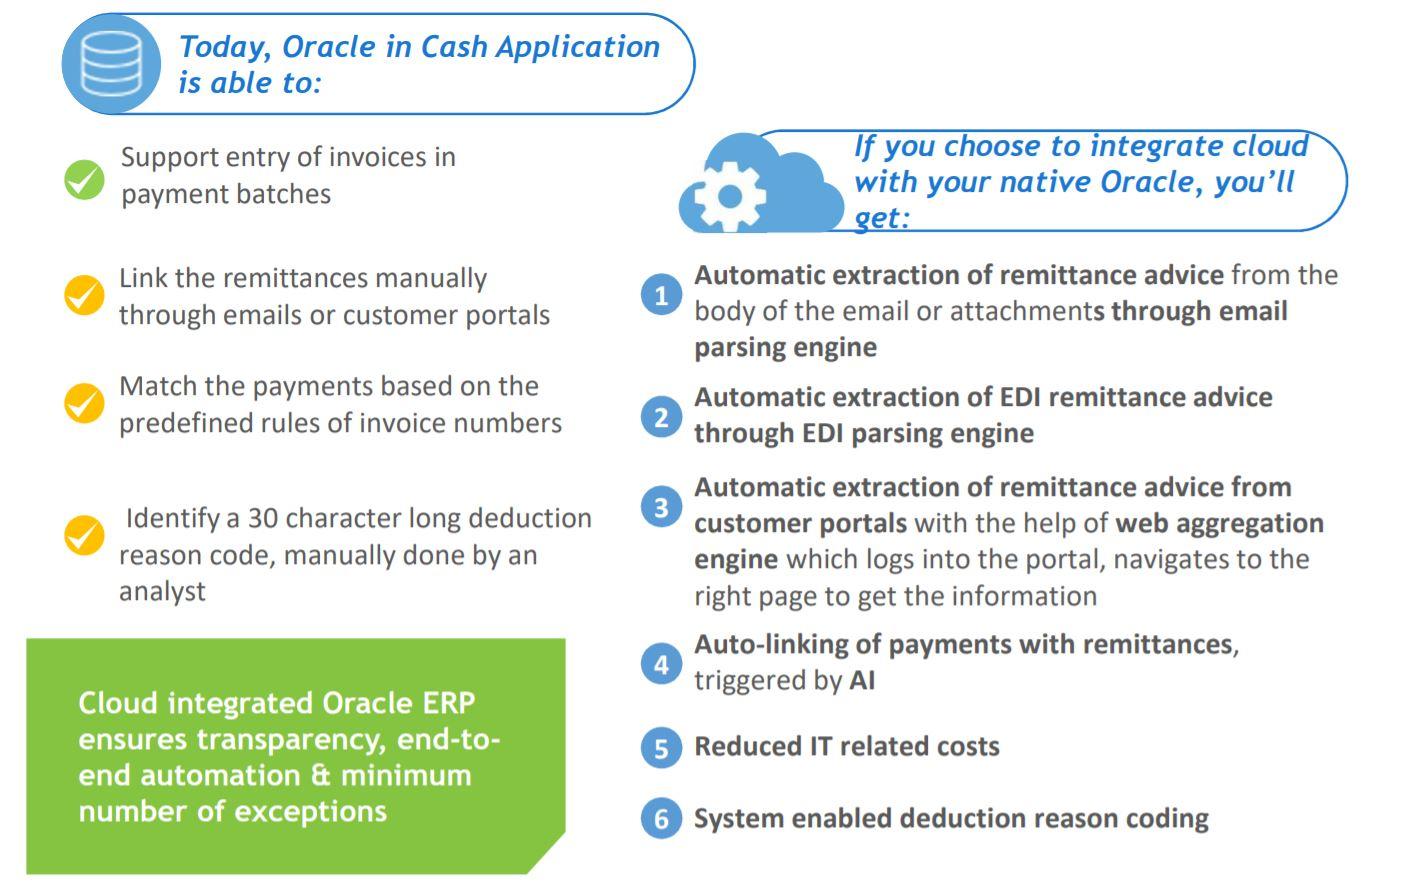 Cloud integrated Oracle cash application management